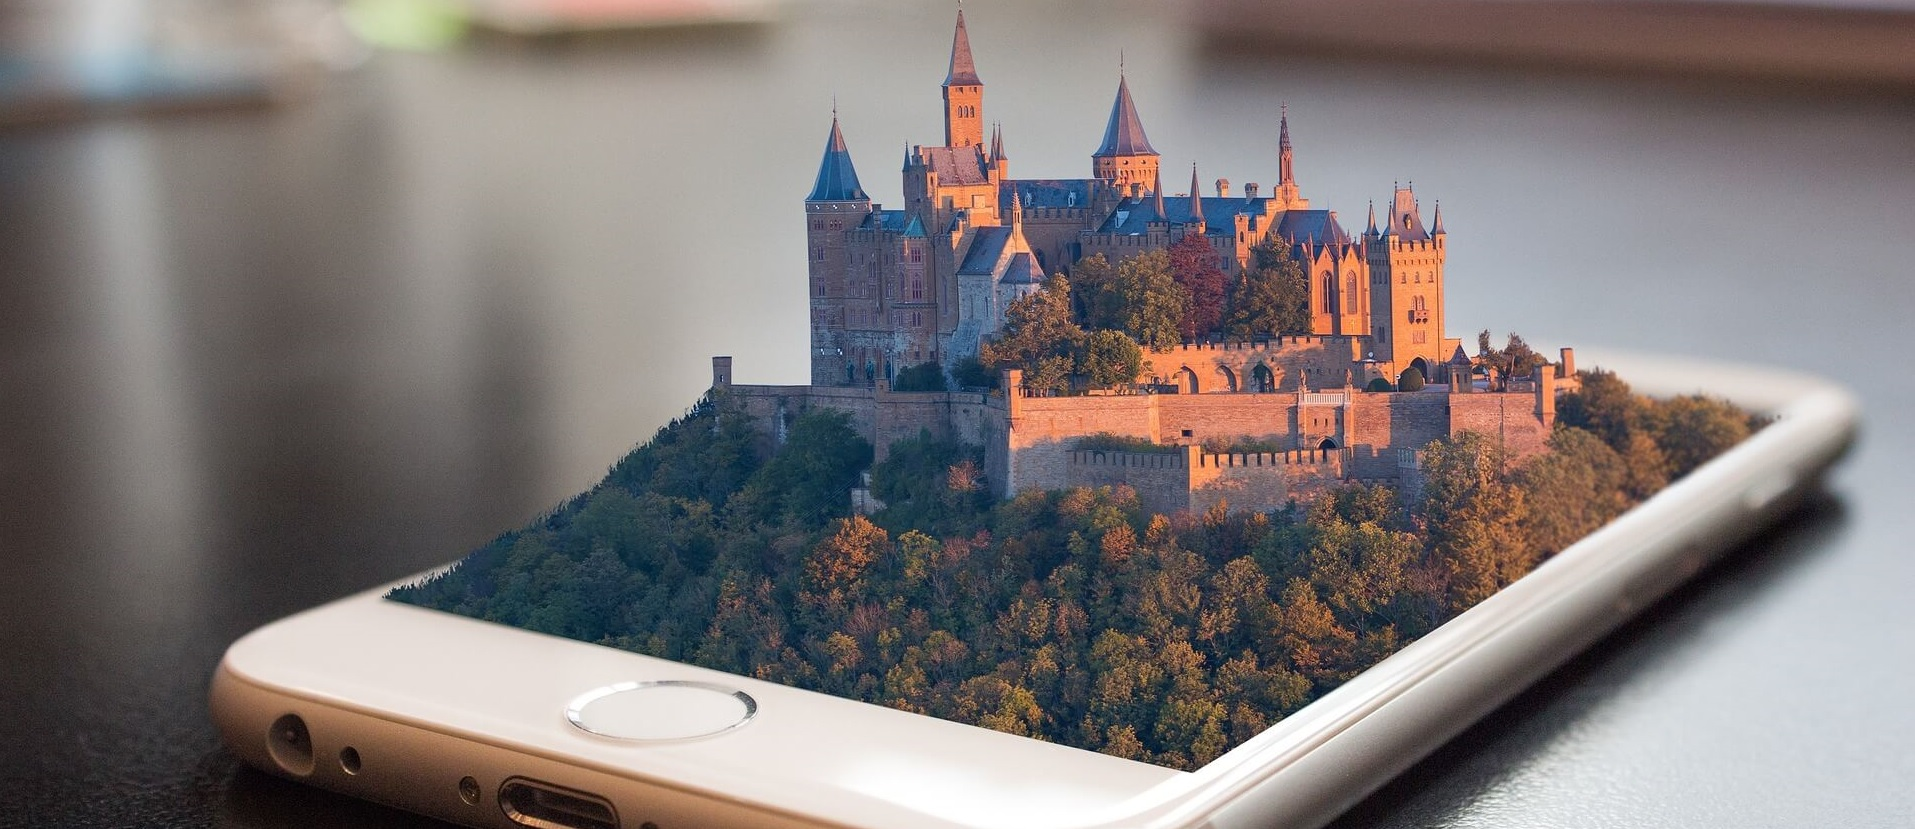 Augmented reality lezingen en workshops